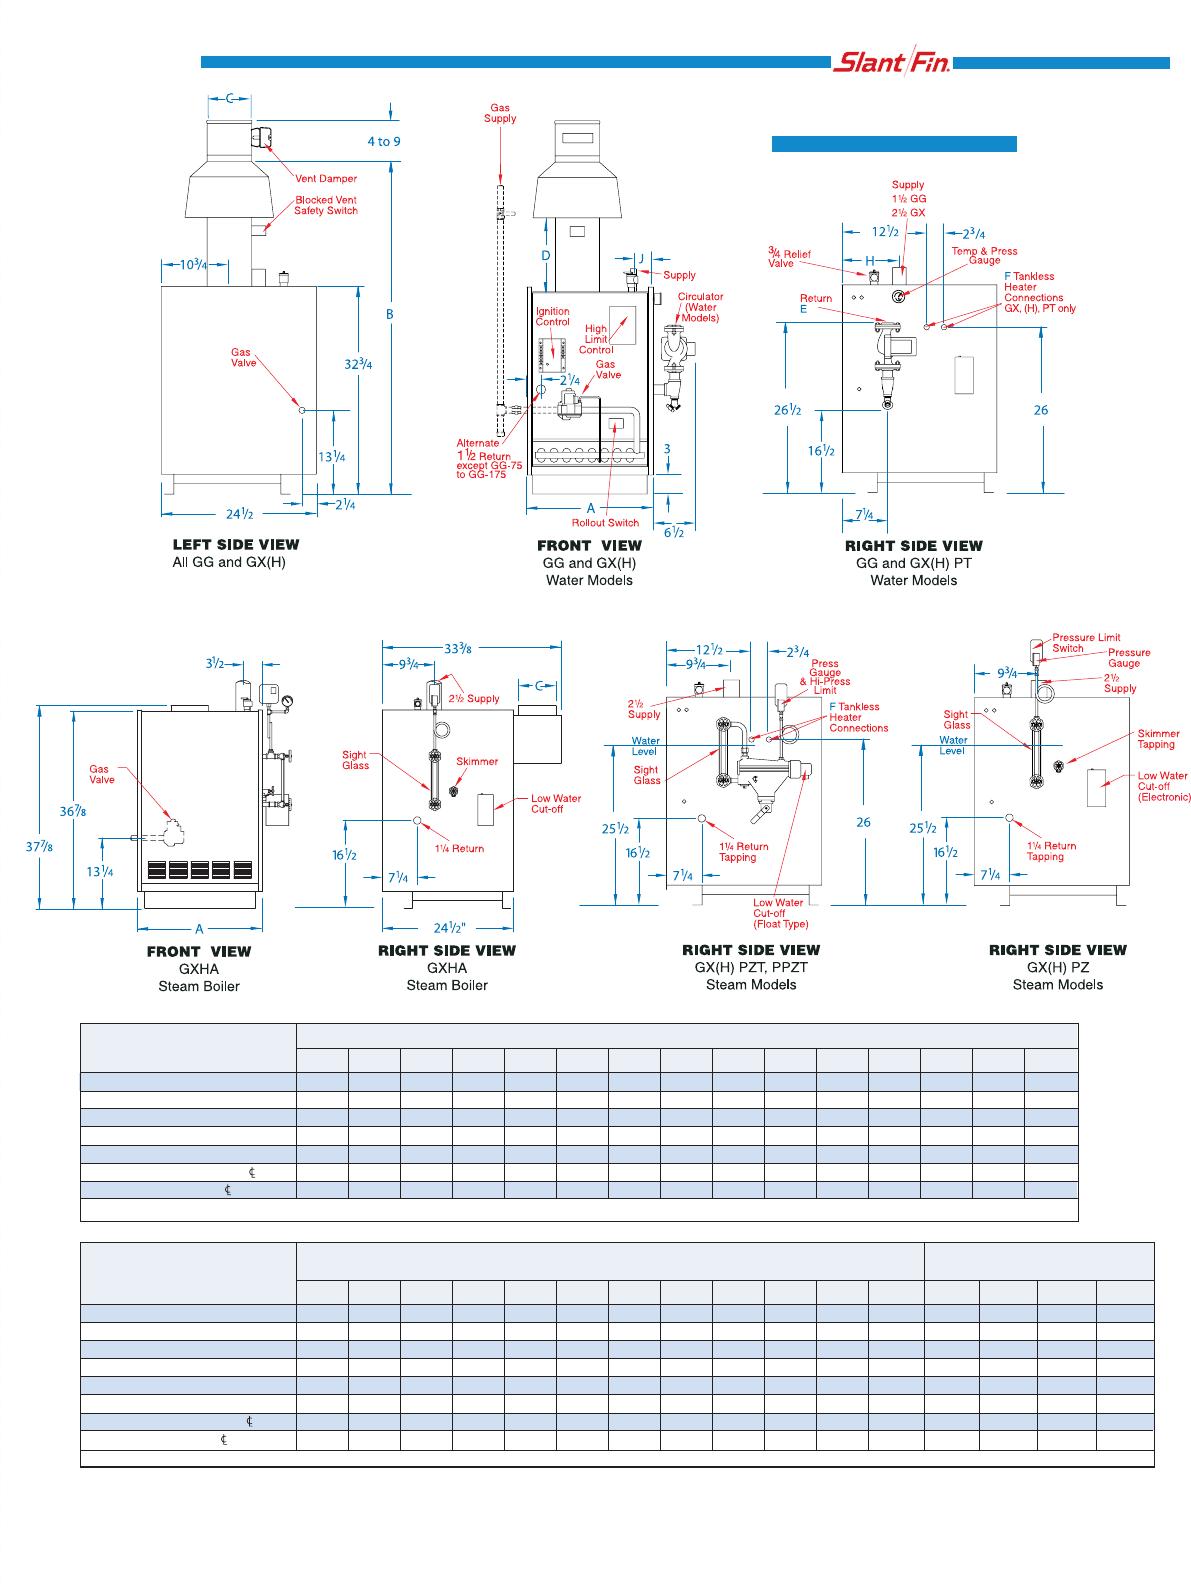 Slant Fin Boiler Steam Wiring Diagram Trusted Munchkin Electrical Diagrams Zone Valve Diy